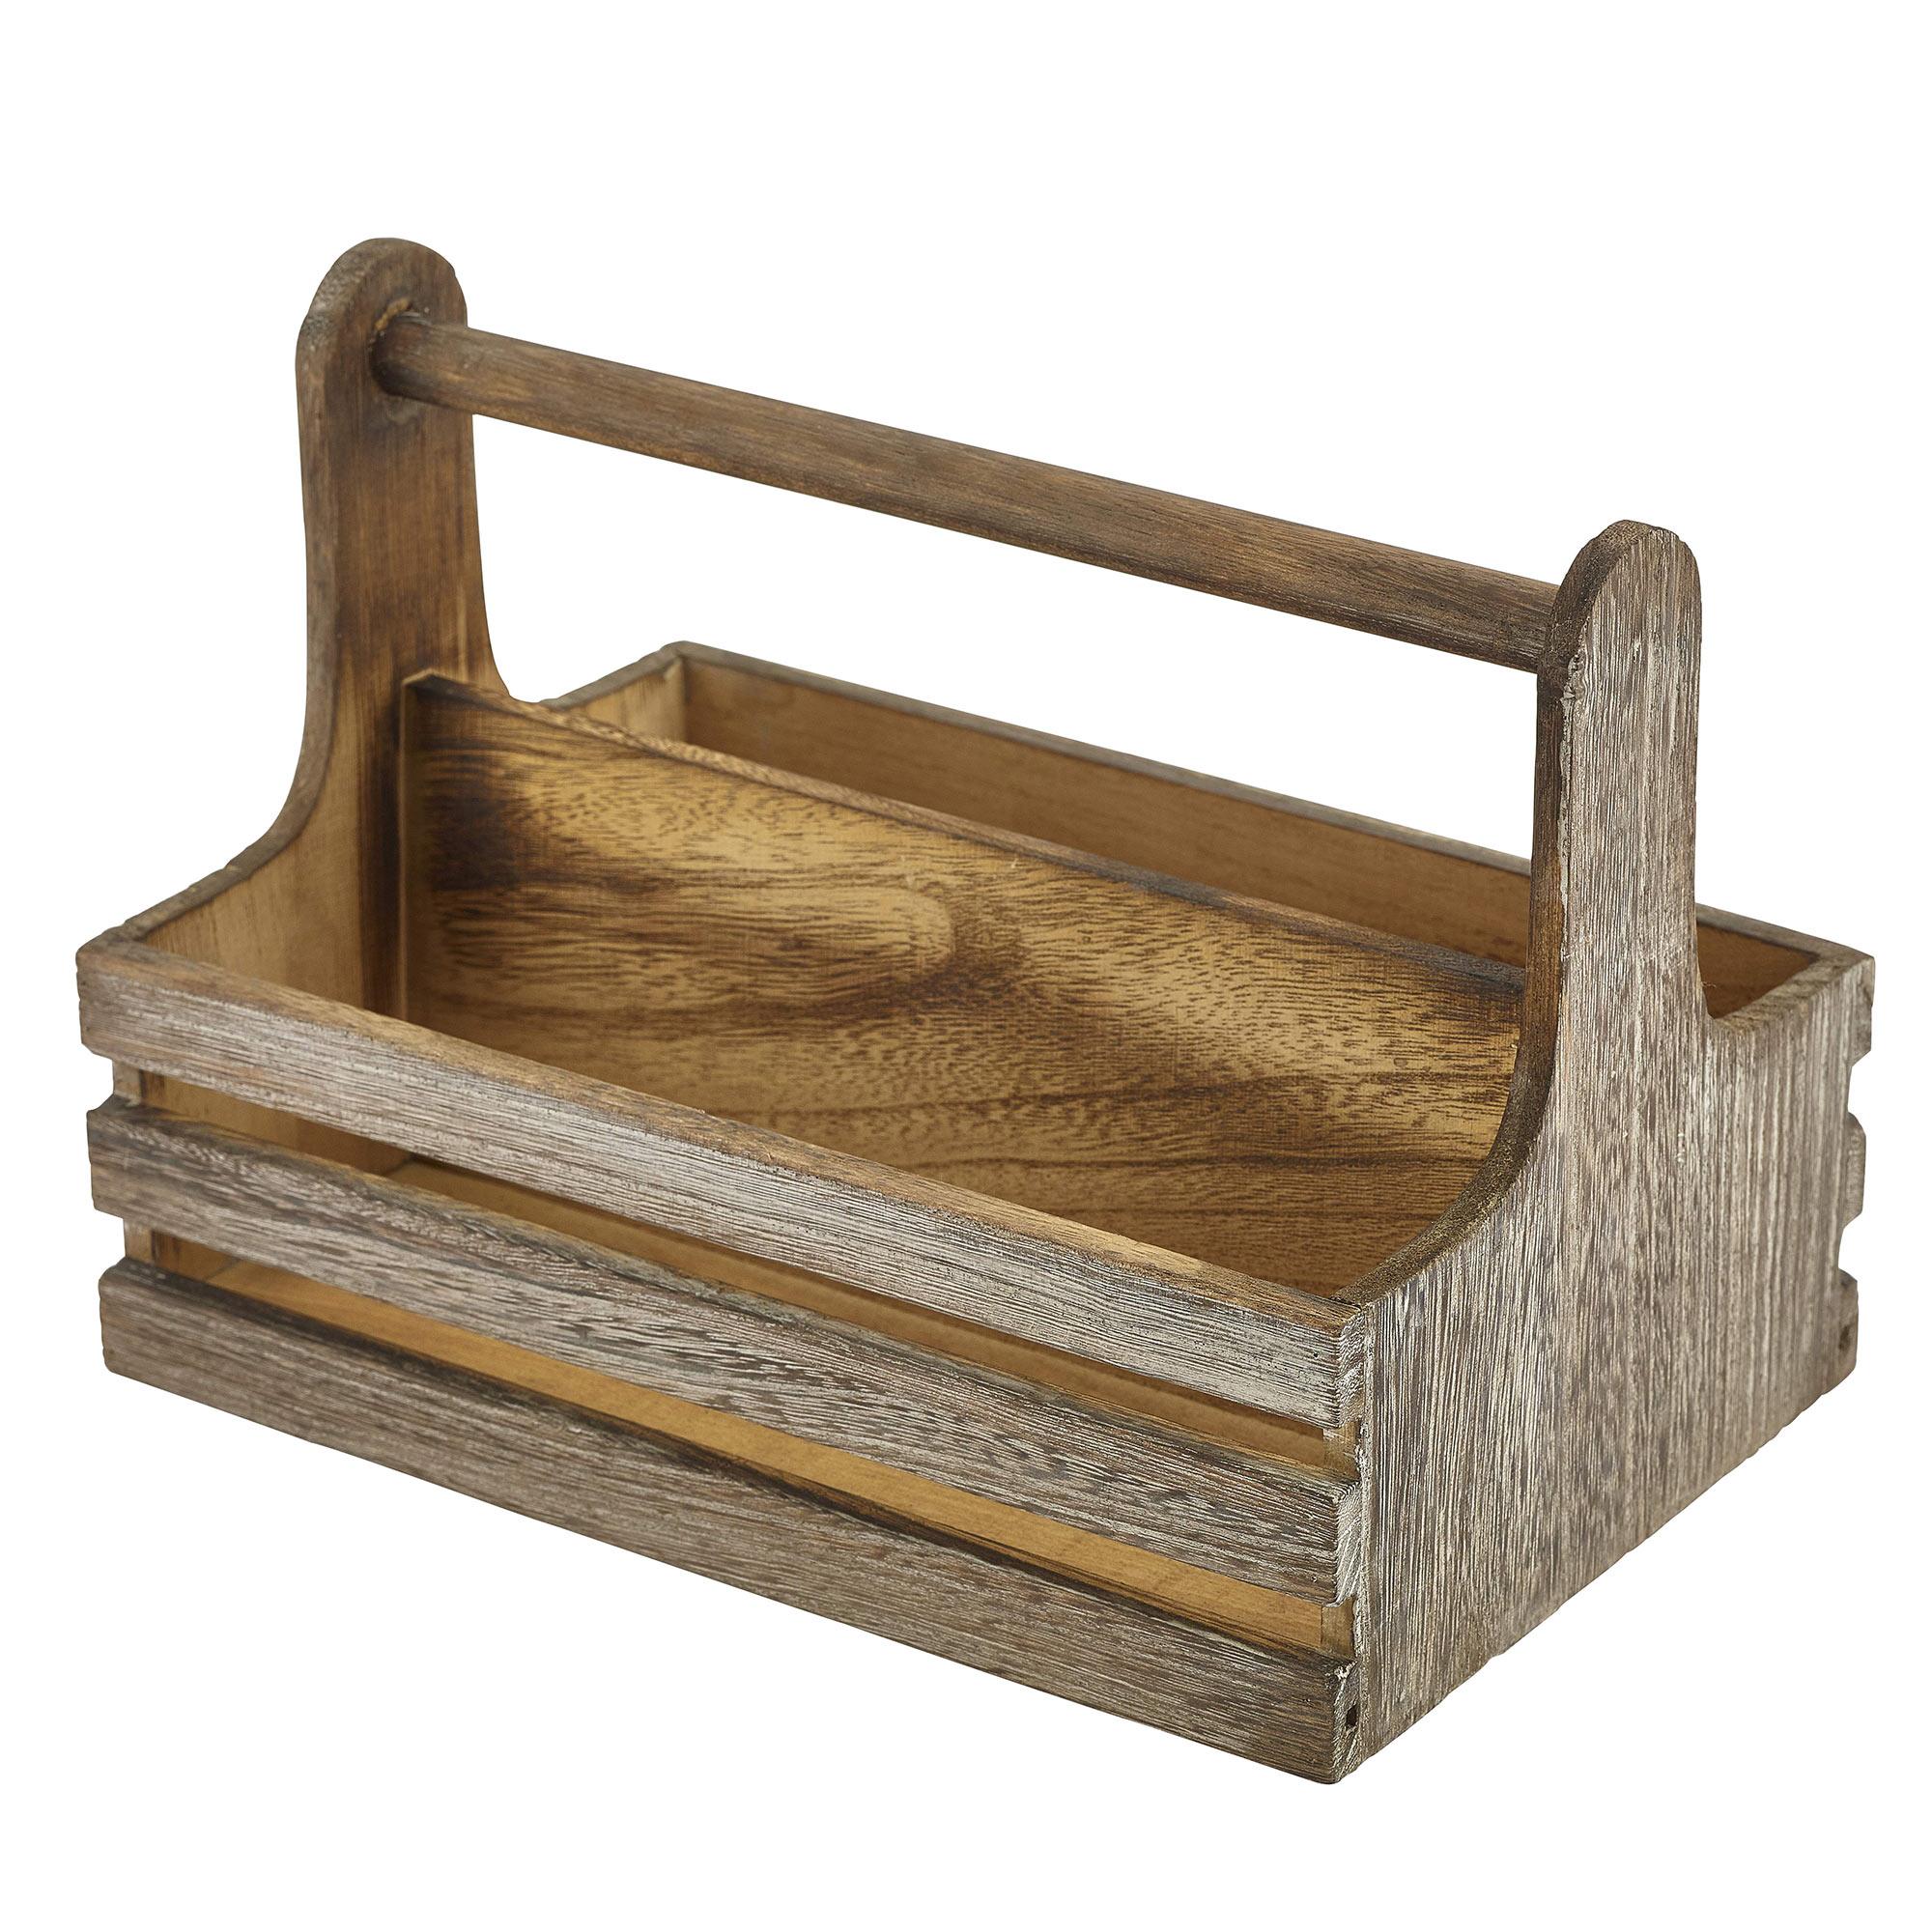 Genware Rustic Wooden Table Caddy : 128133large from www.drinkstuff.com size 2000 x 2000 jpeg 504kB